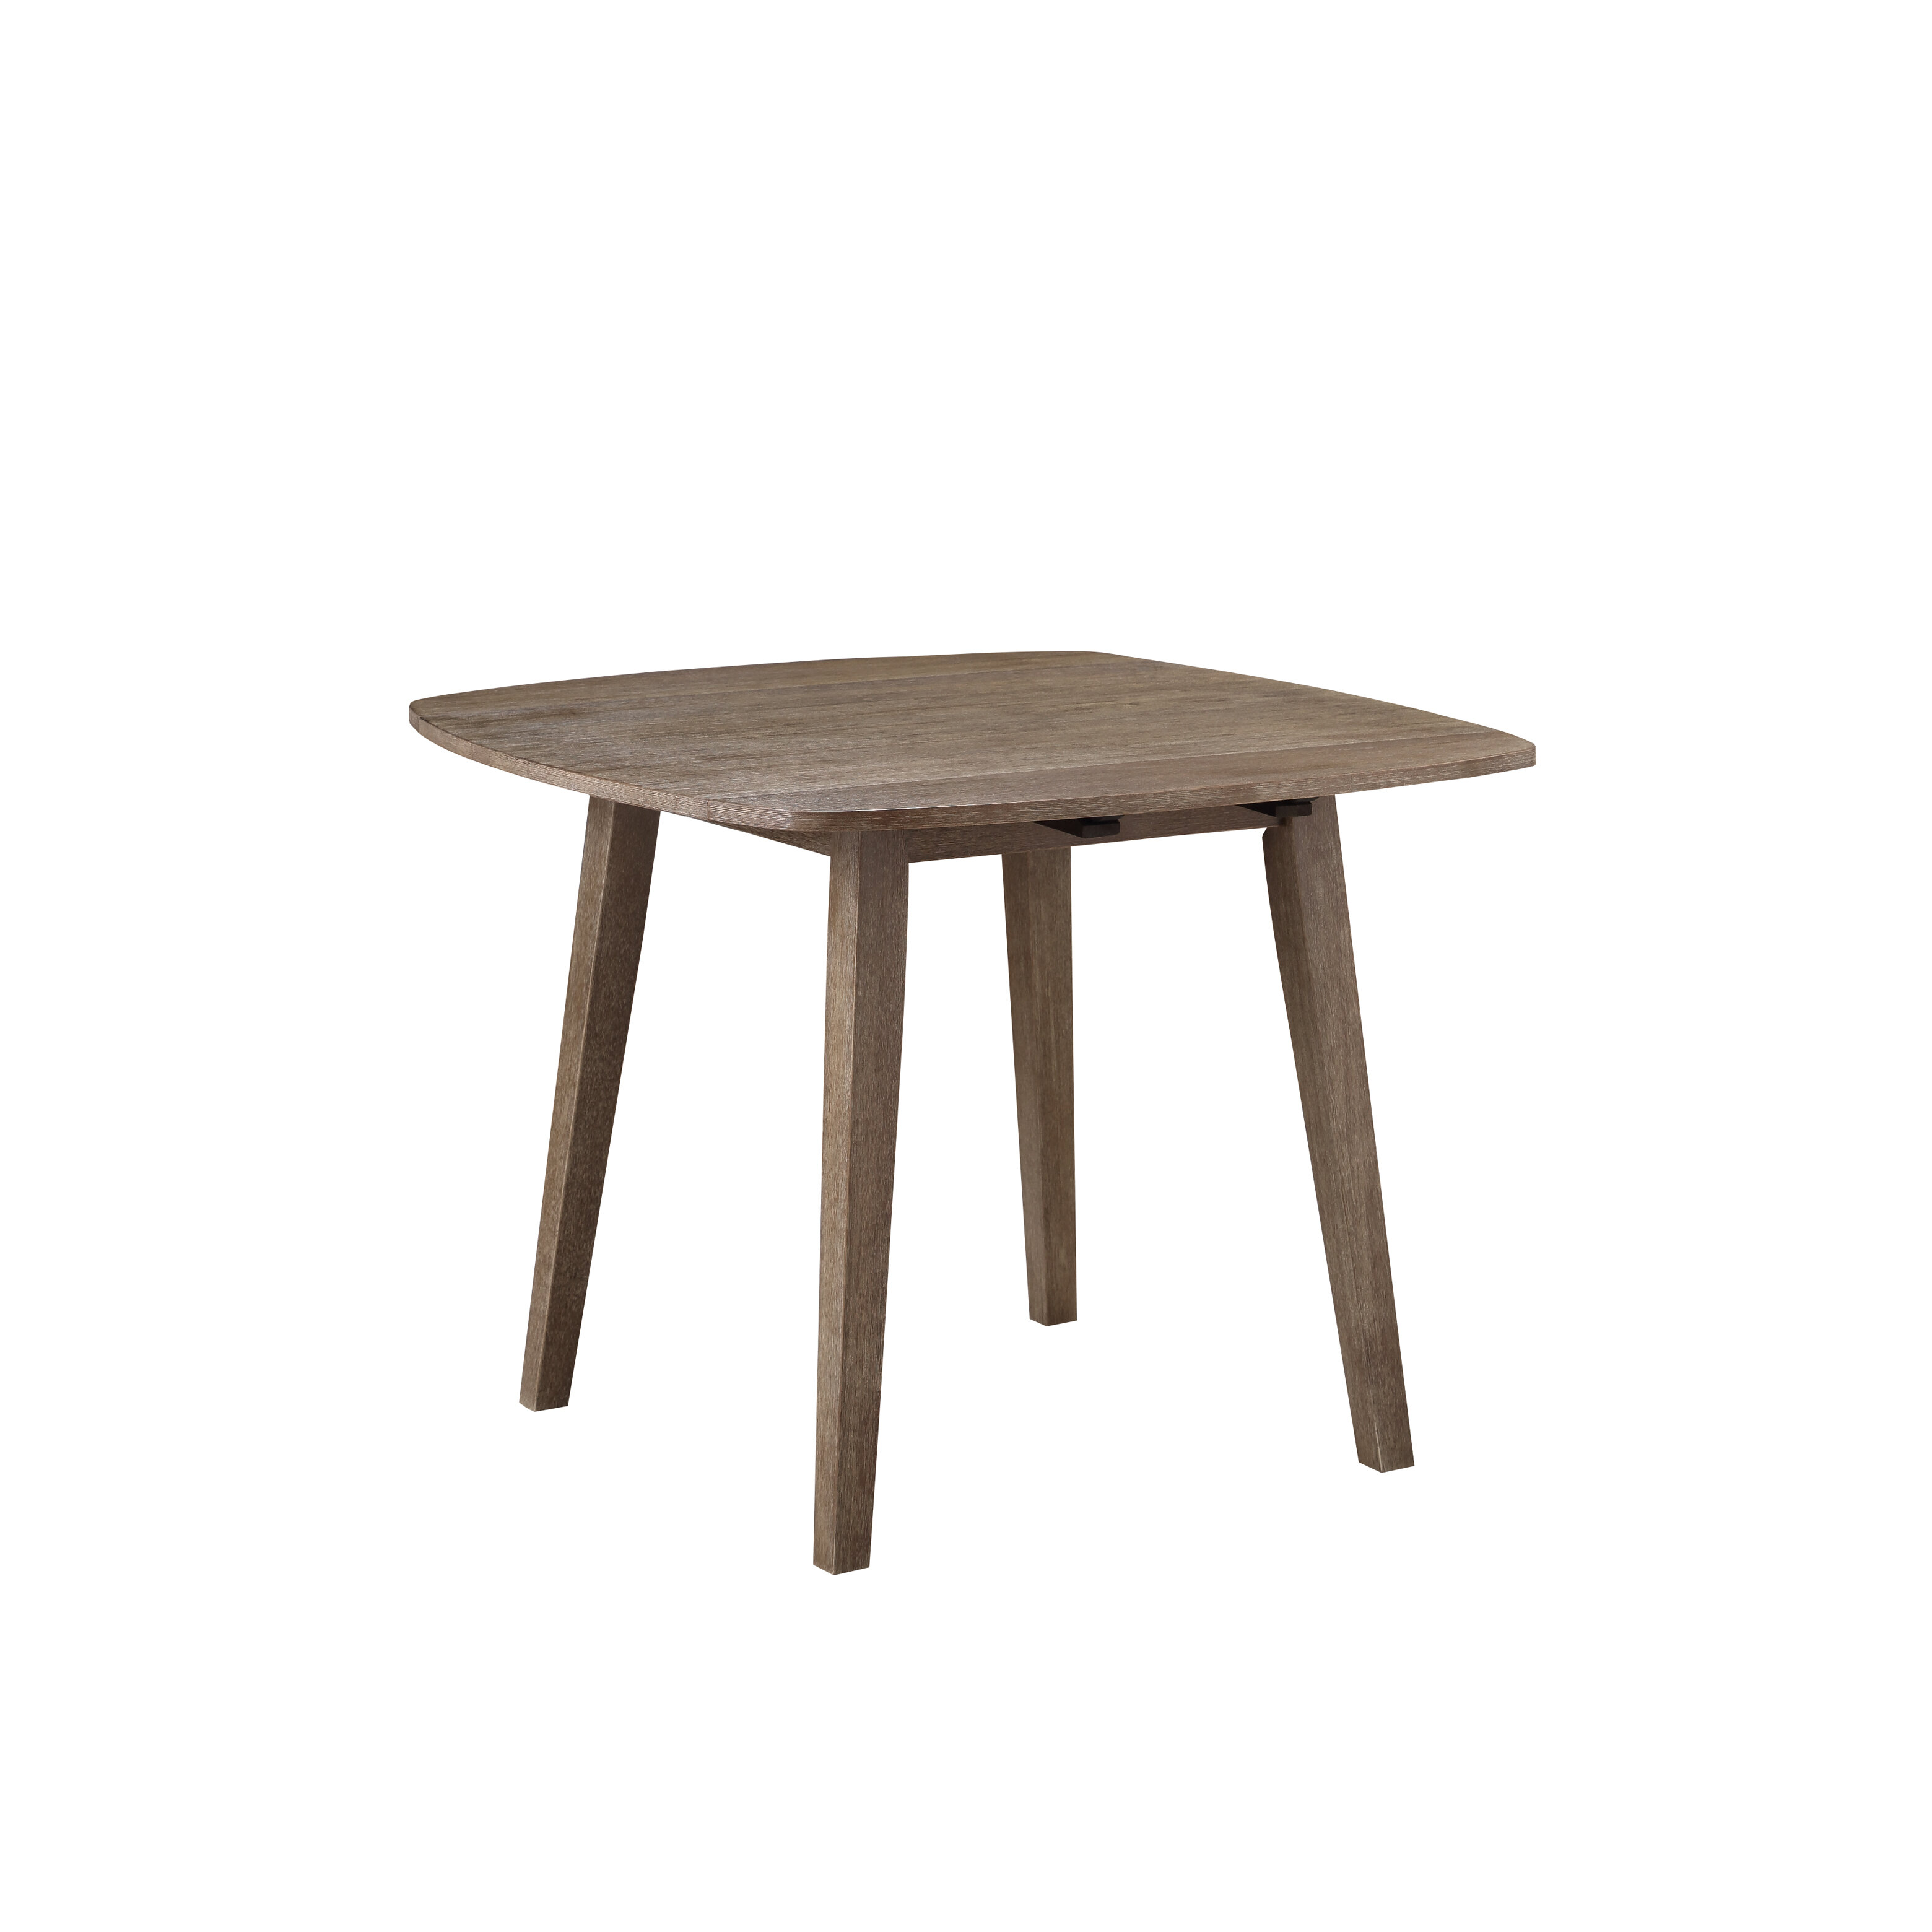 Winthrop Solid Wood Drop Leaf Dining Table Reviews Allmodern